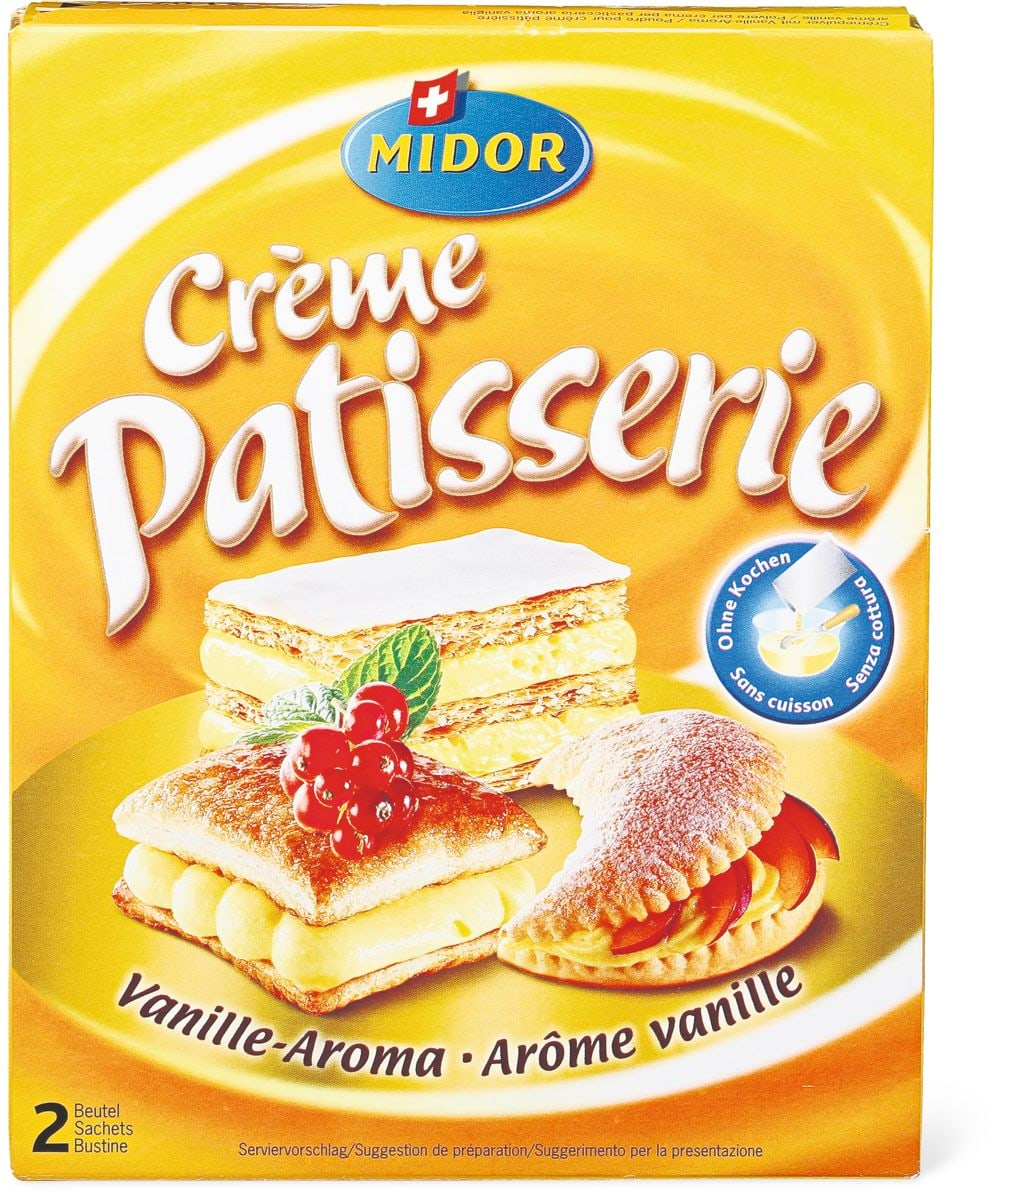 Crème Patisserie Vanille Migros